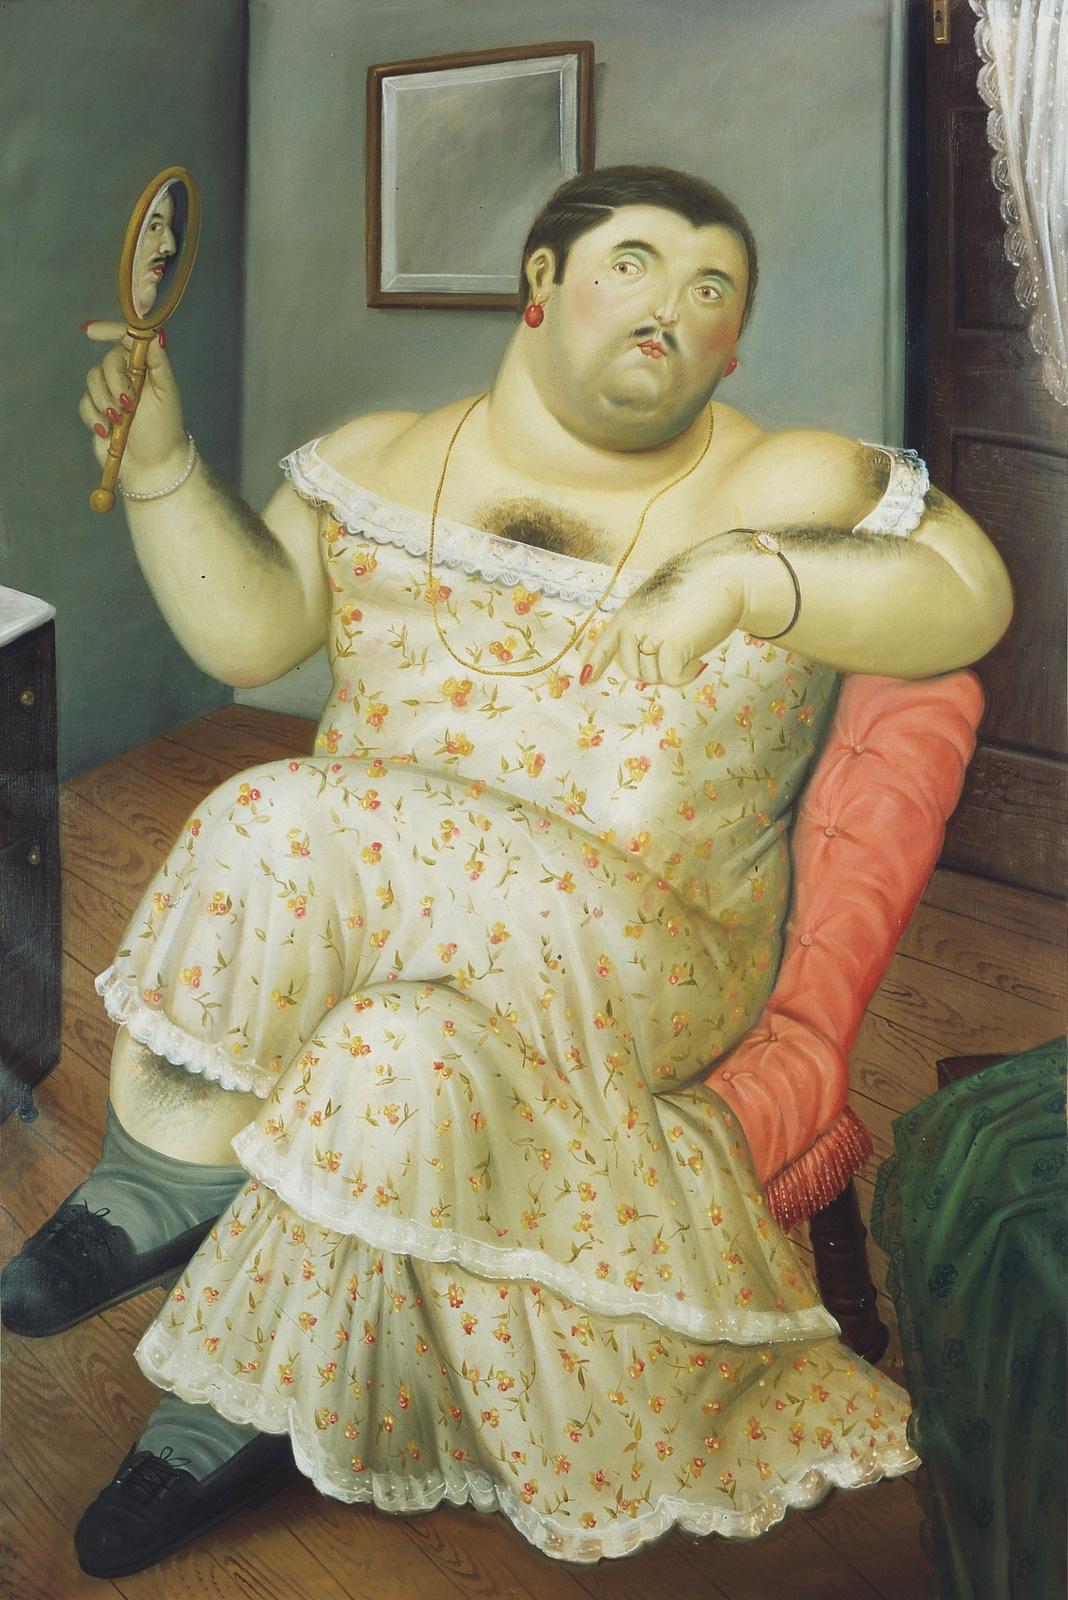 Fernando Botero. Melancholy